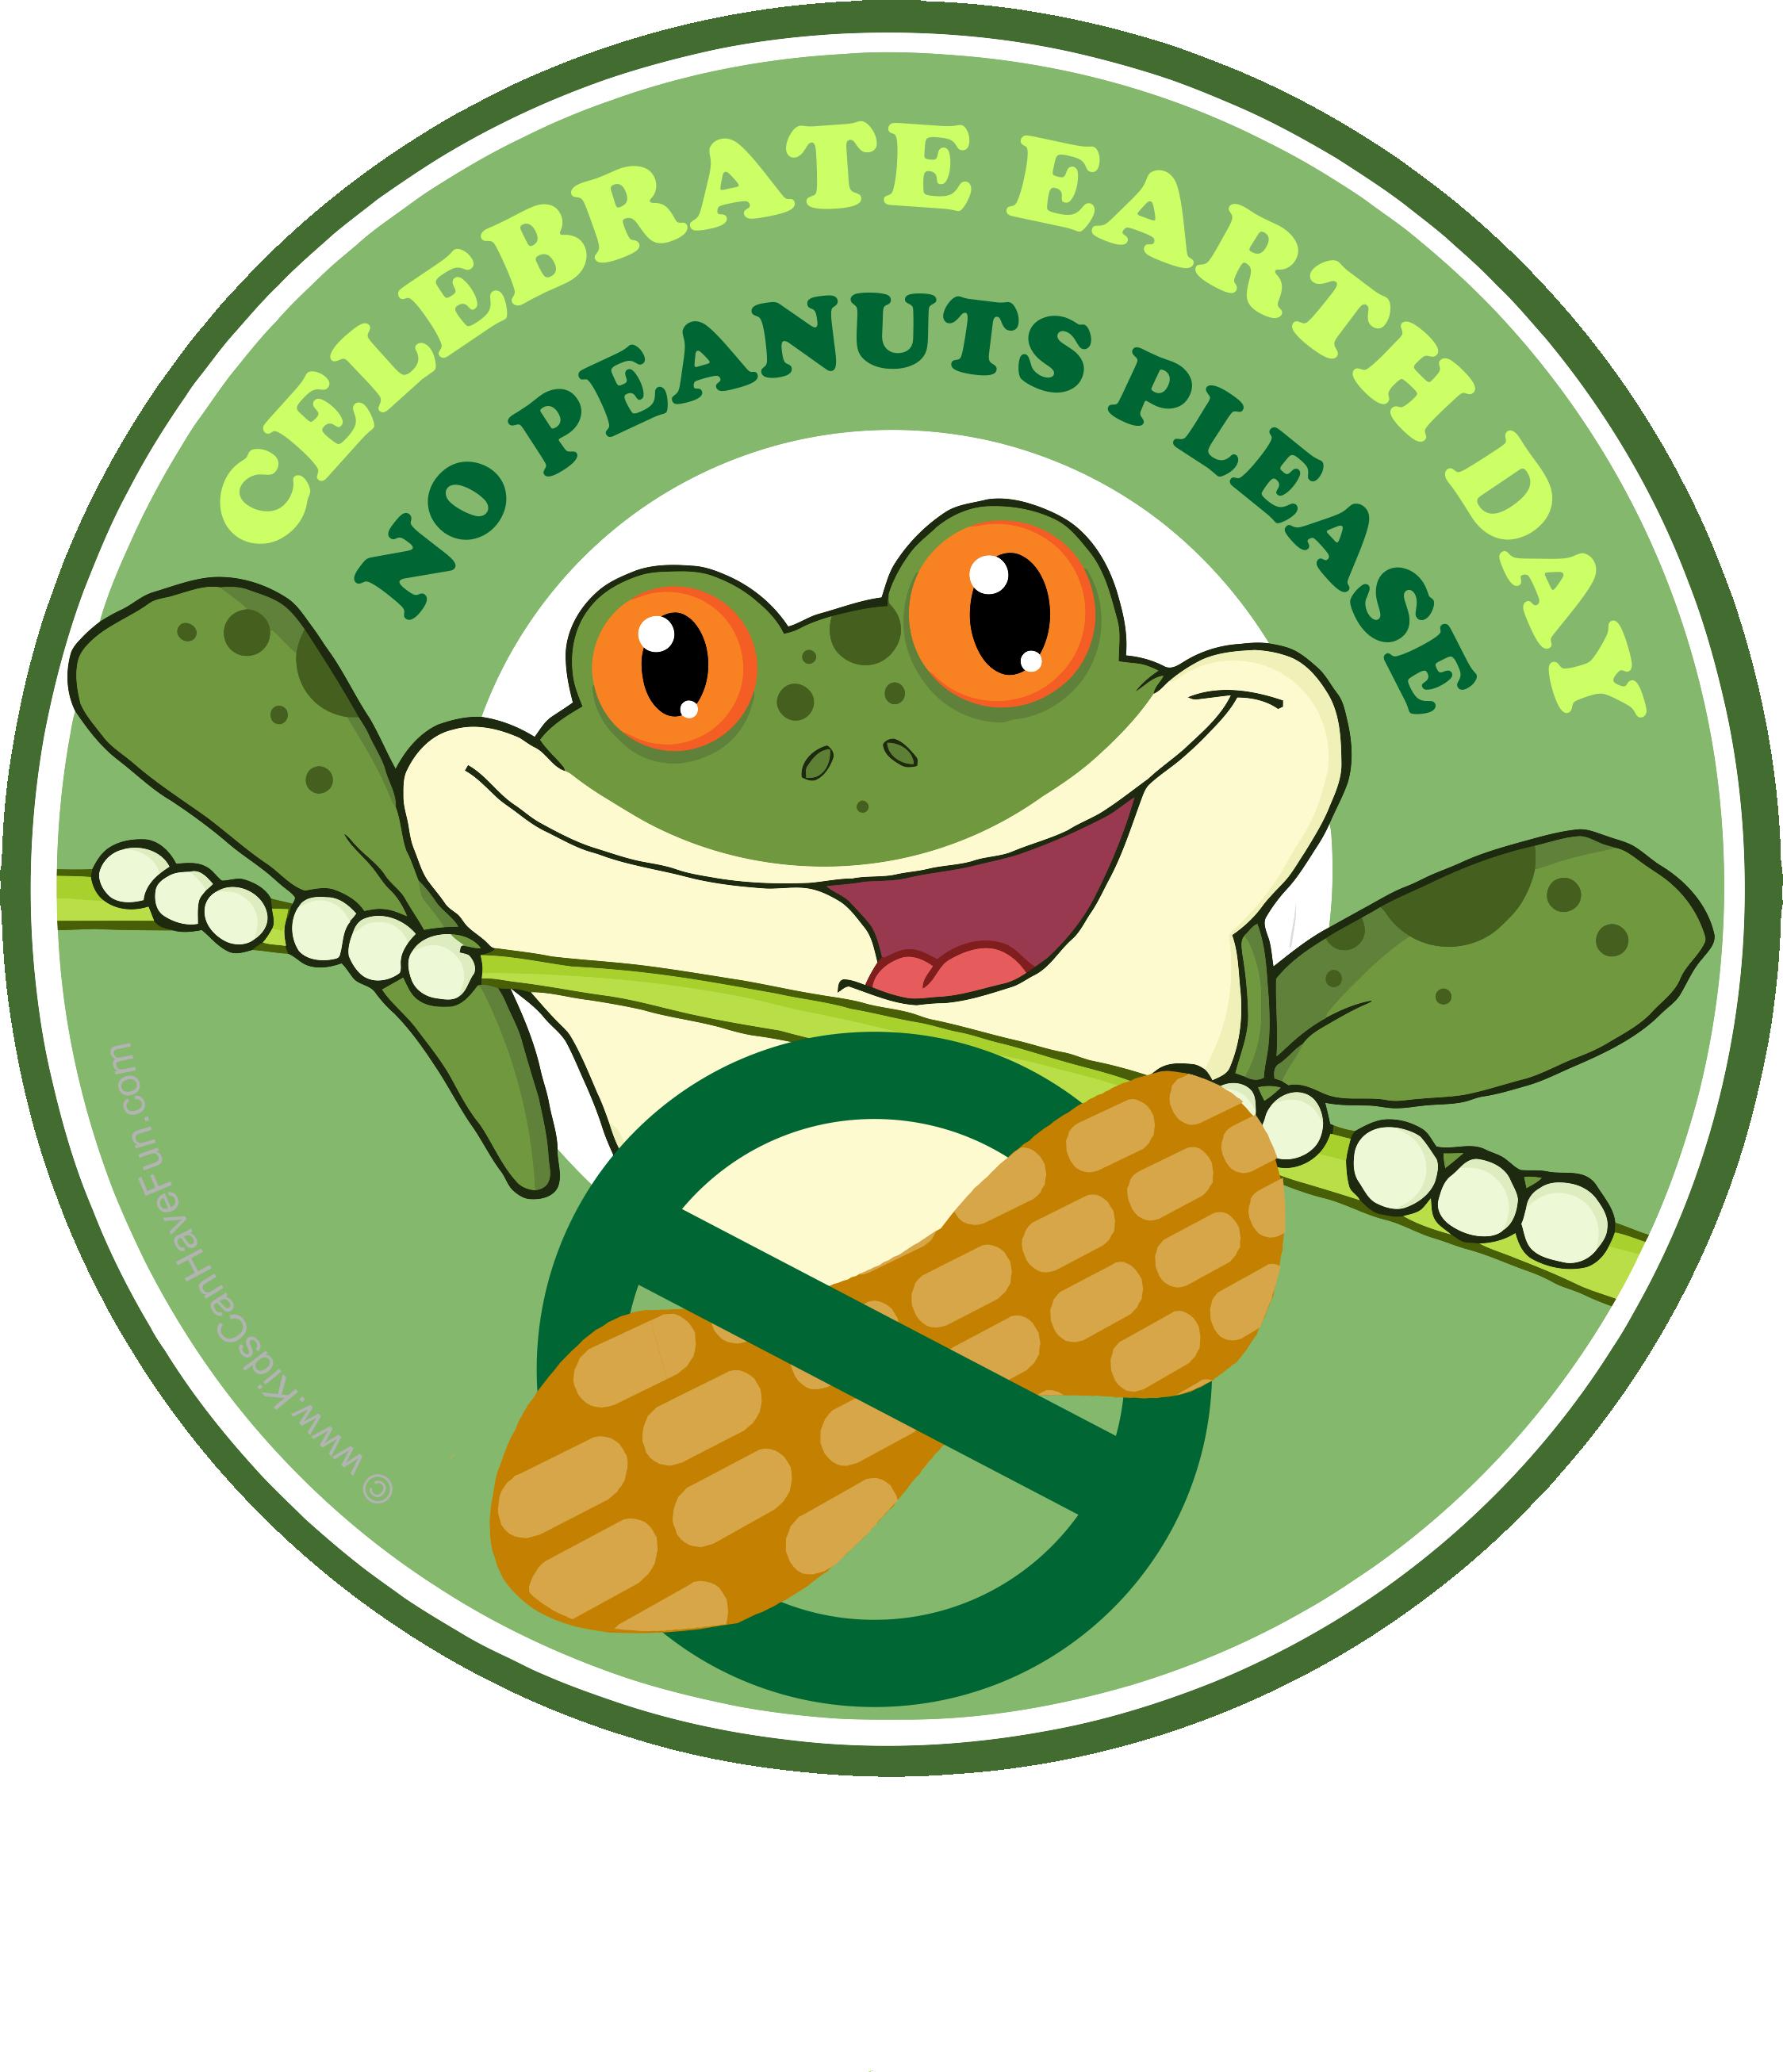 Label clipart food pyramid. Earth day no peanuts